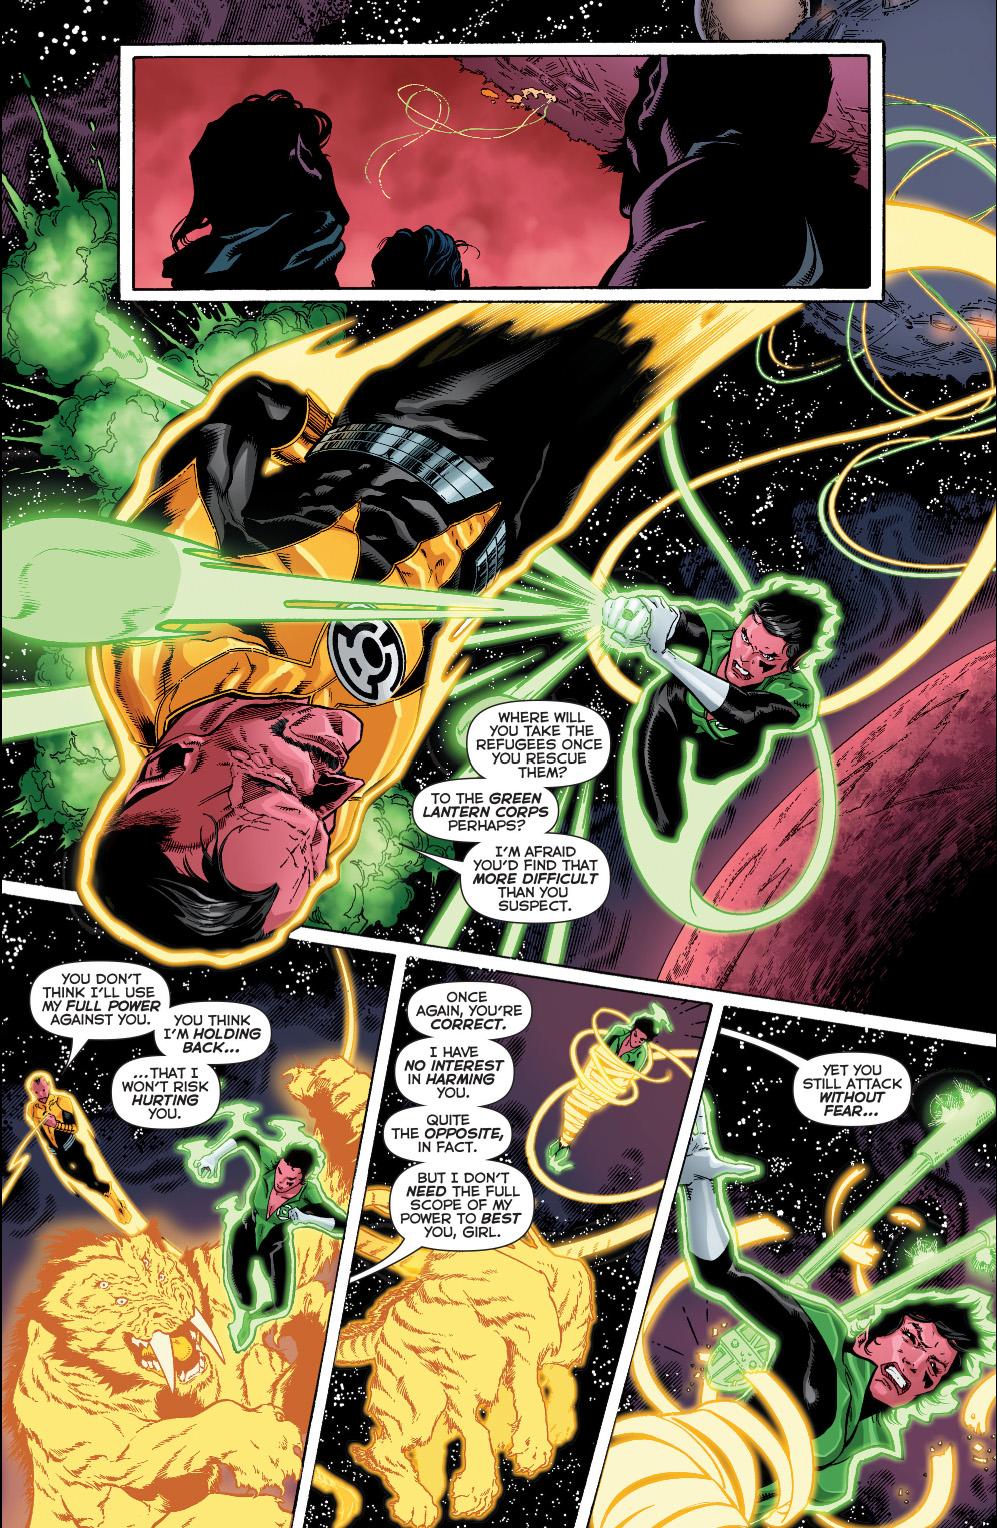 Soranik Natu Vs Sinestro Comicnewbies